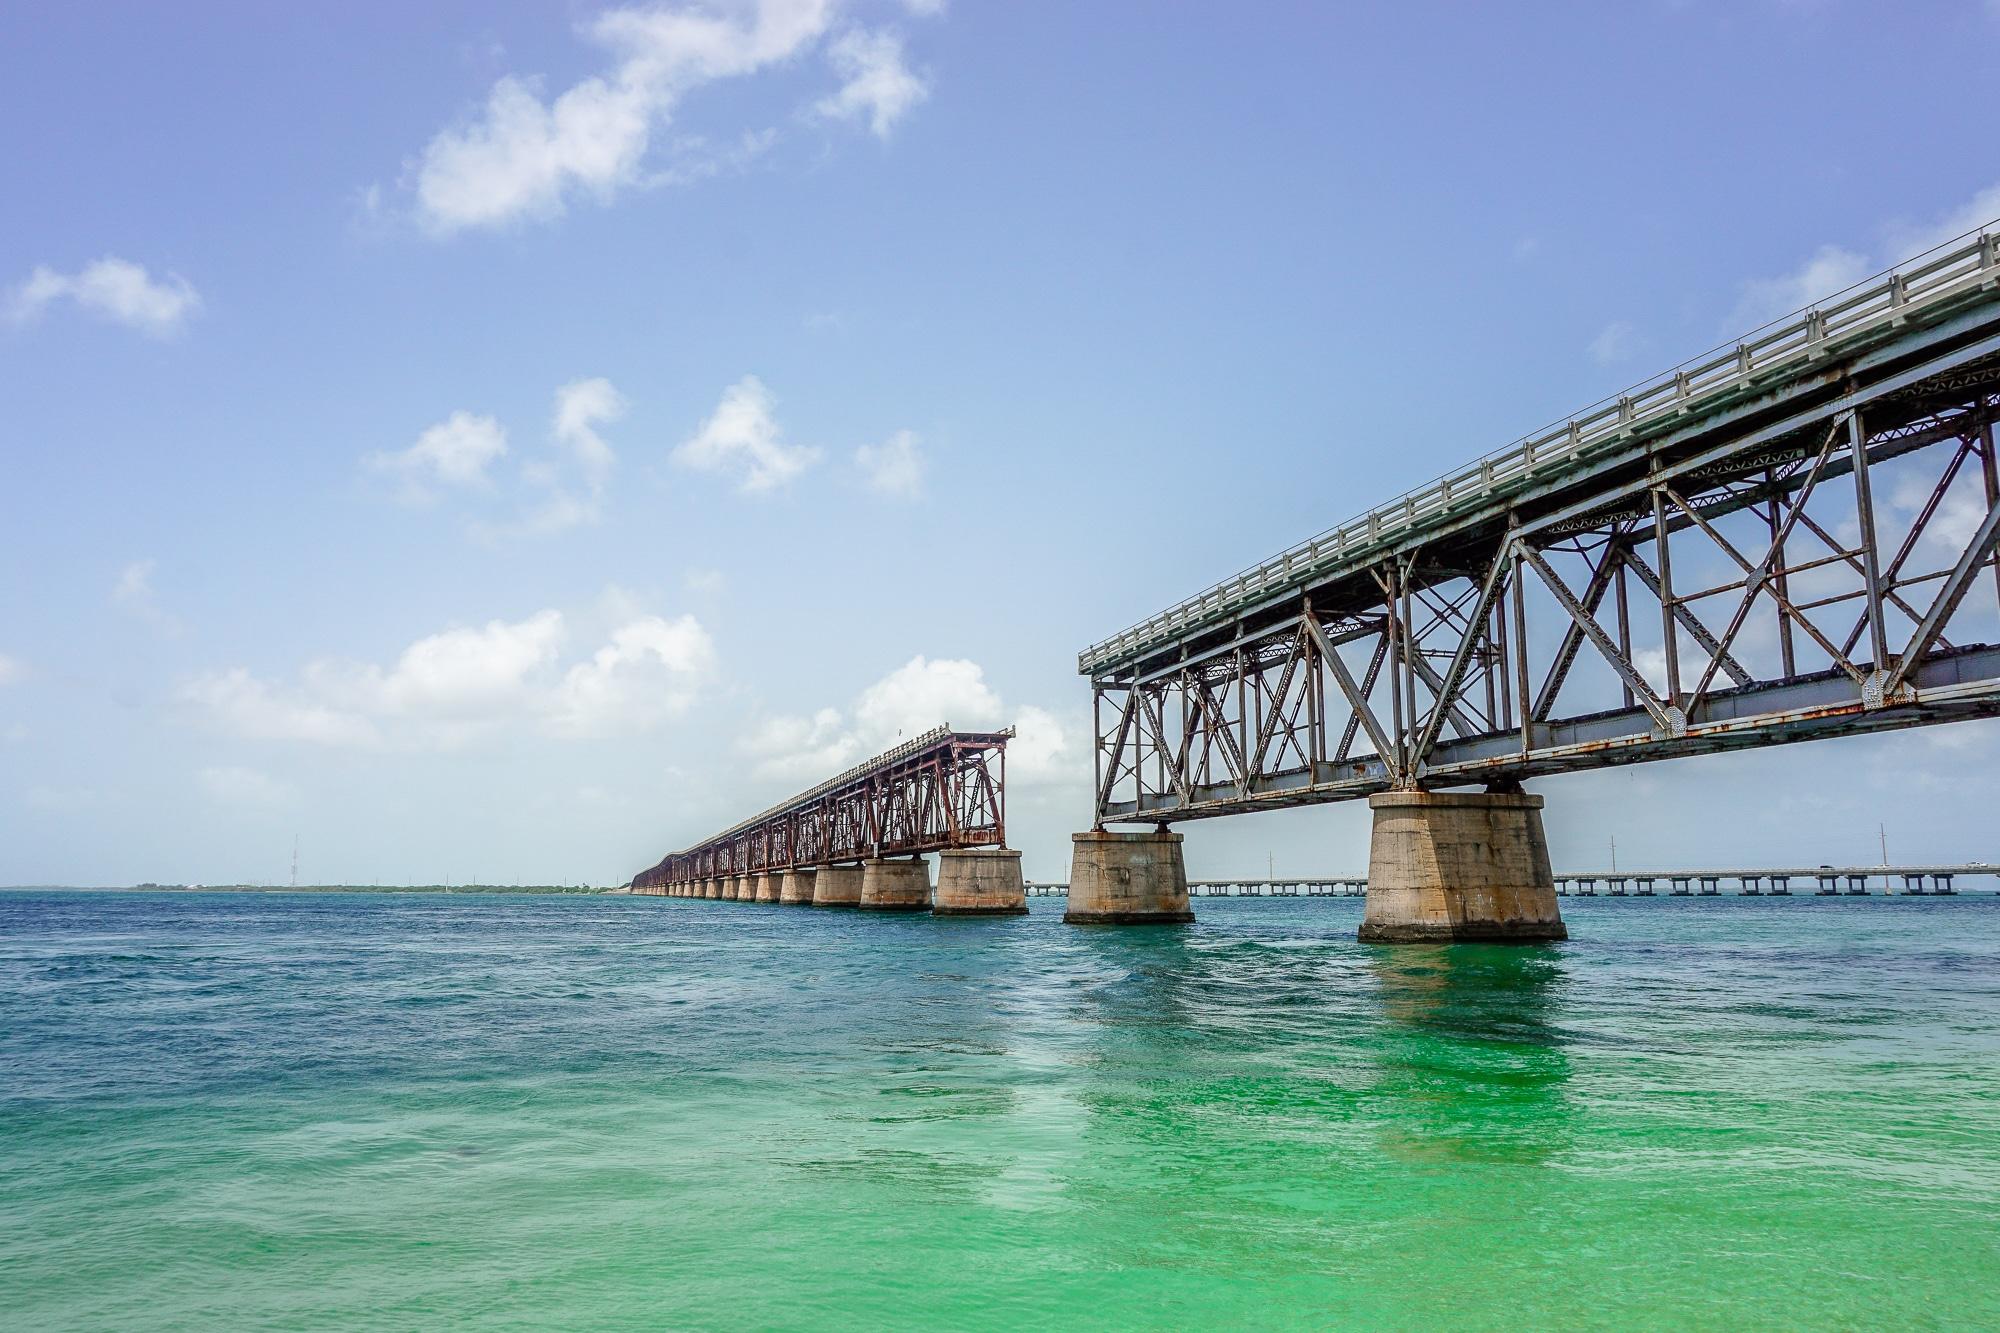 Bahia Honda State Park: Karibikflair & schönste Strände der Florida Keys